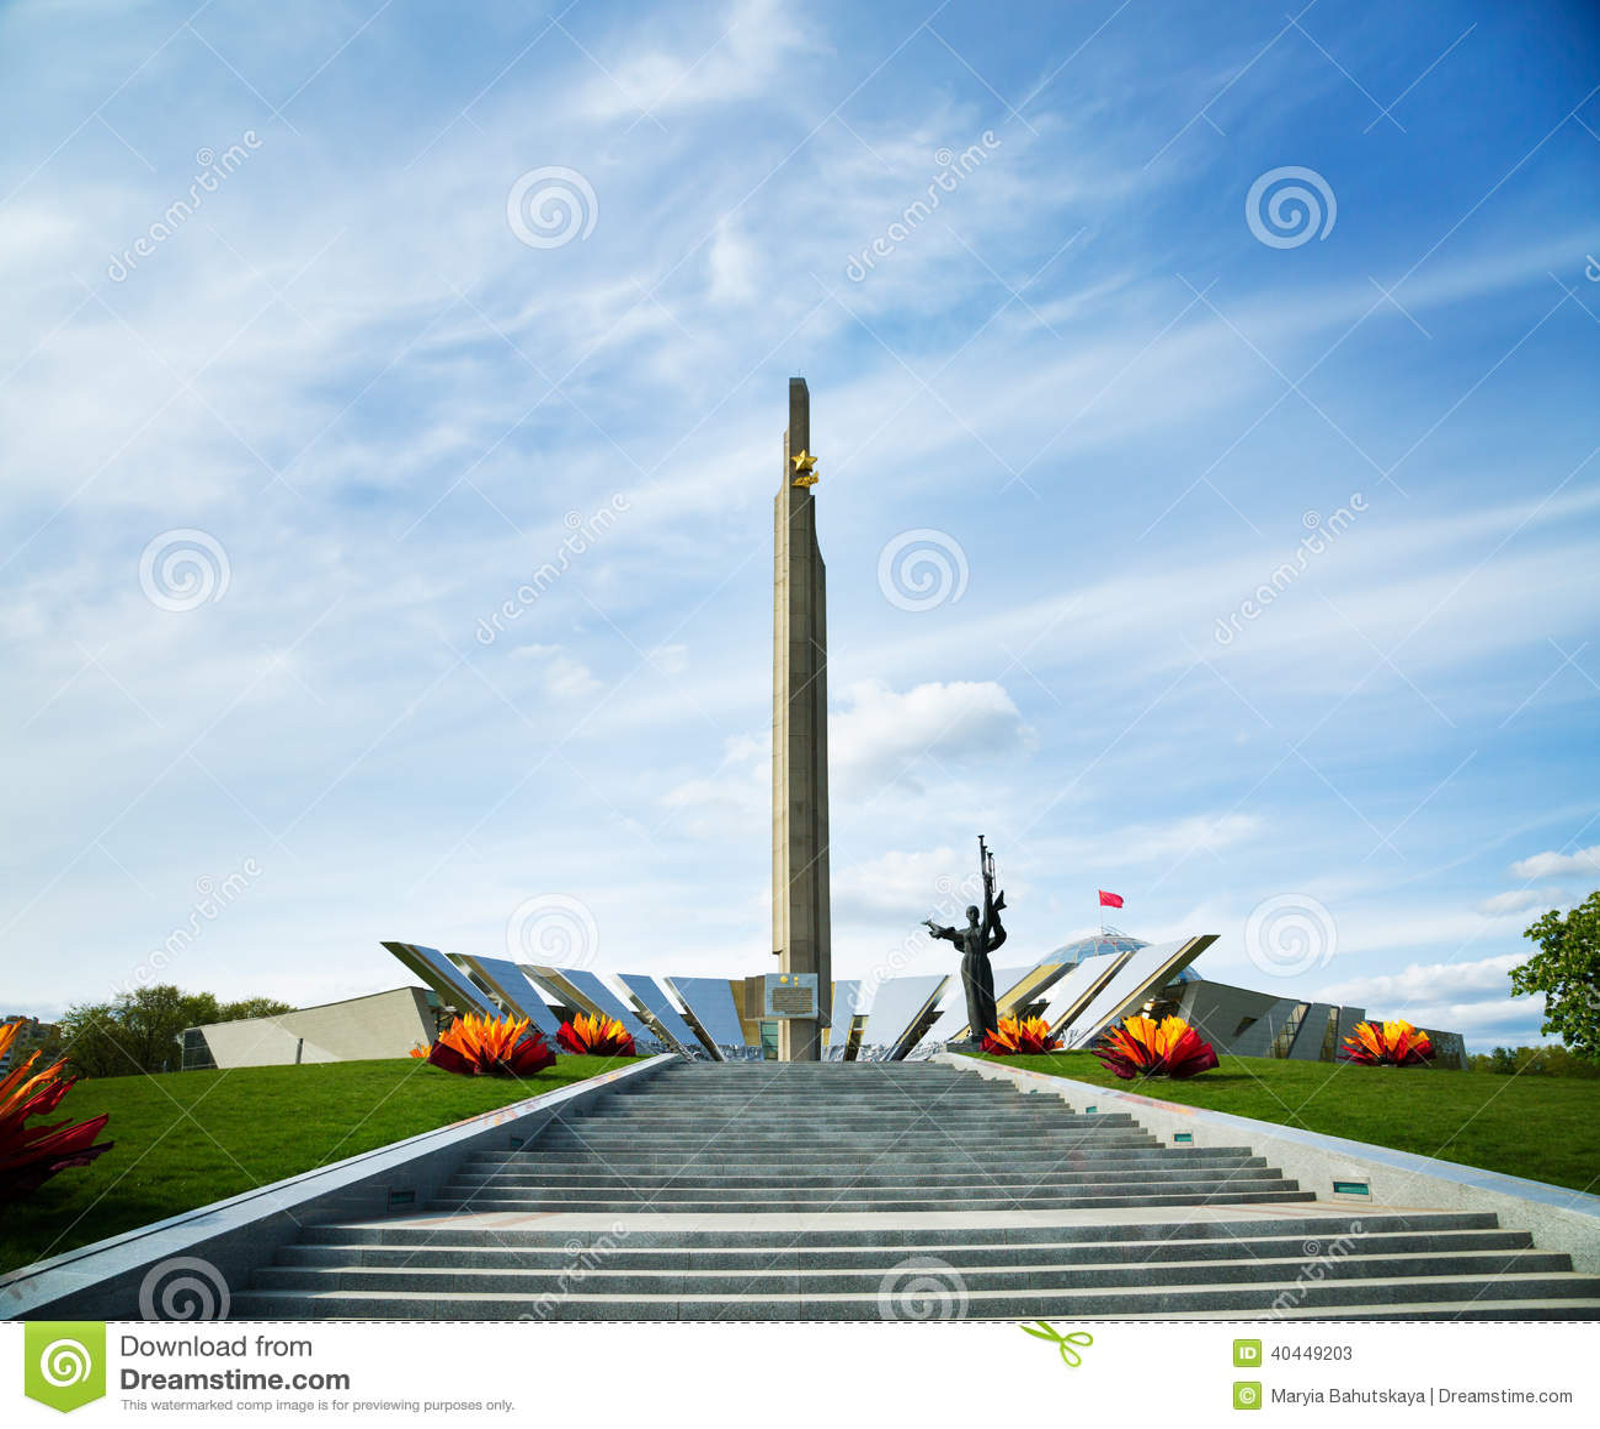 Download Obelisk Hero City Minsk In Belarus Stock Image - Image of star, stairway: 40449203